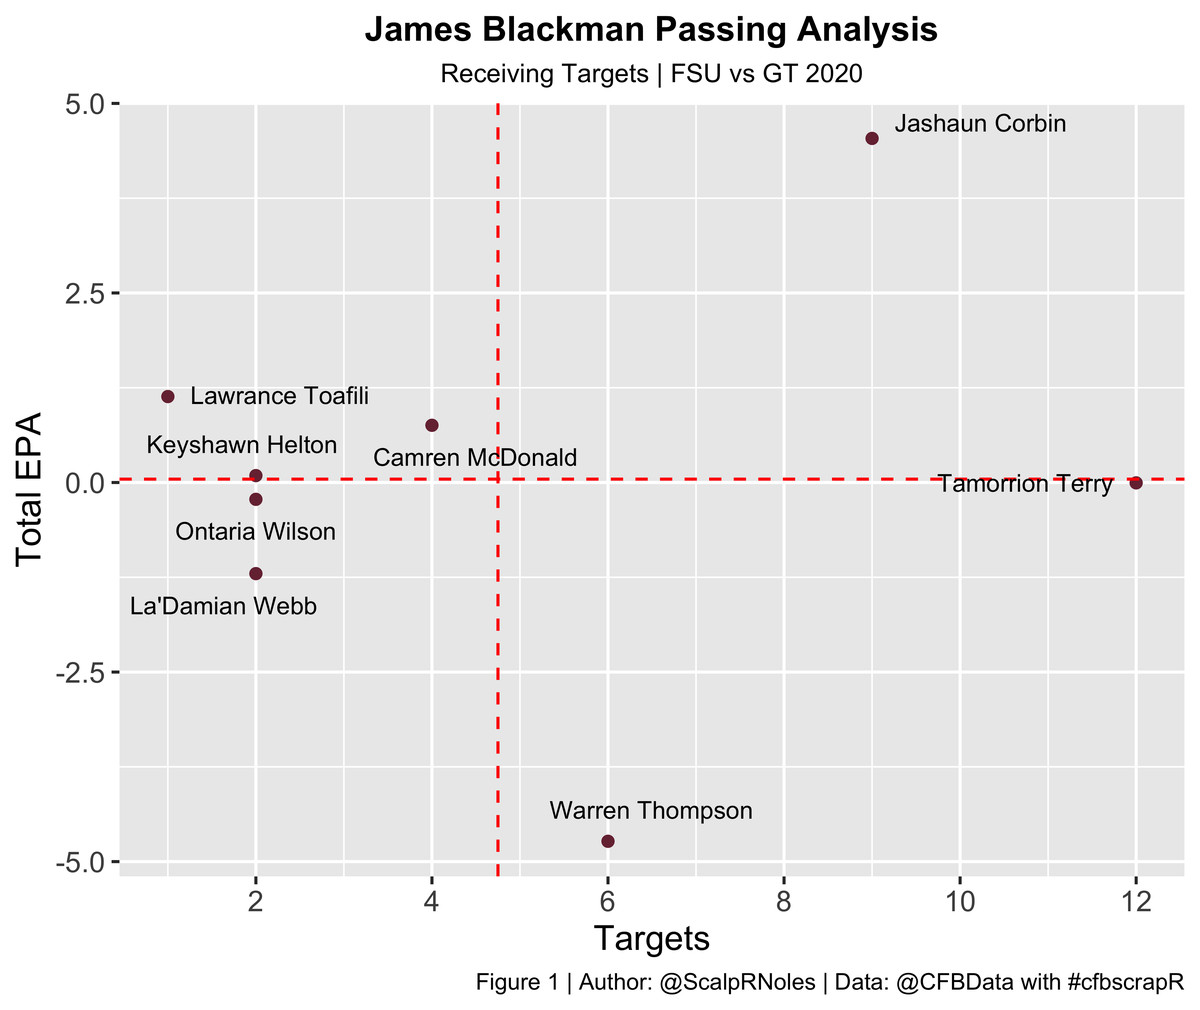 James Blackman Passing Analysis | Data: @CFB_Data via @cfbscrapR | Figure: Jason DeLoach (@ScalpRNoles)